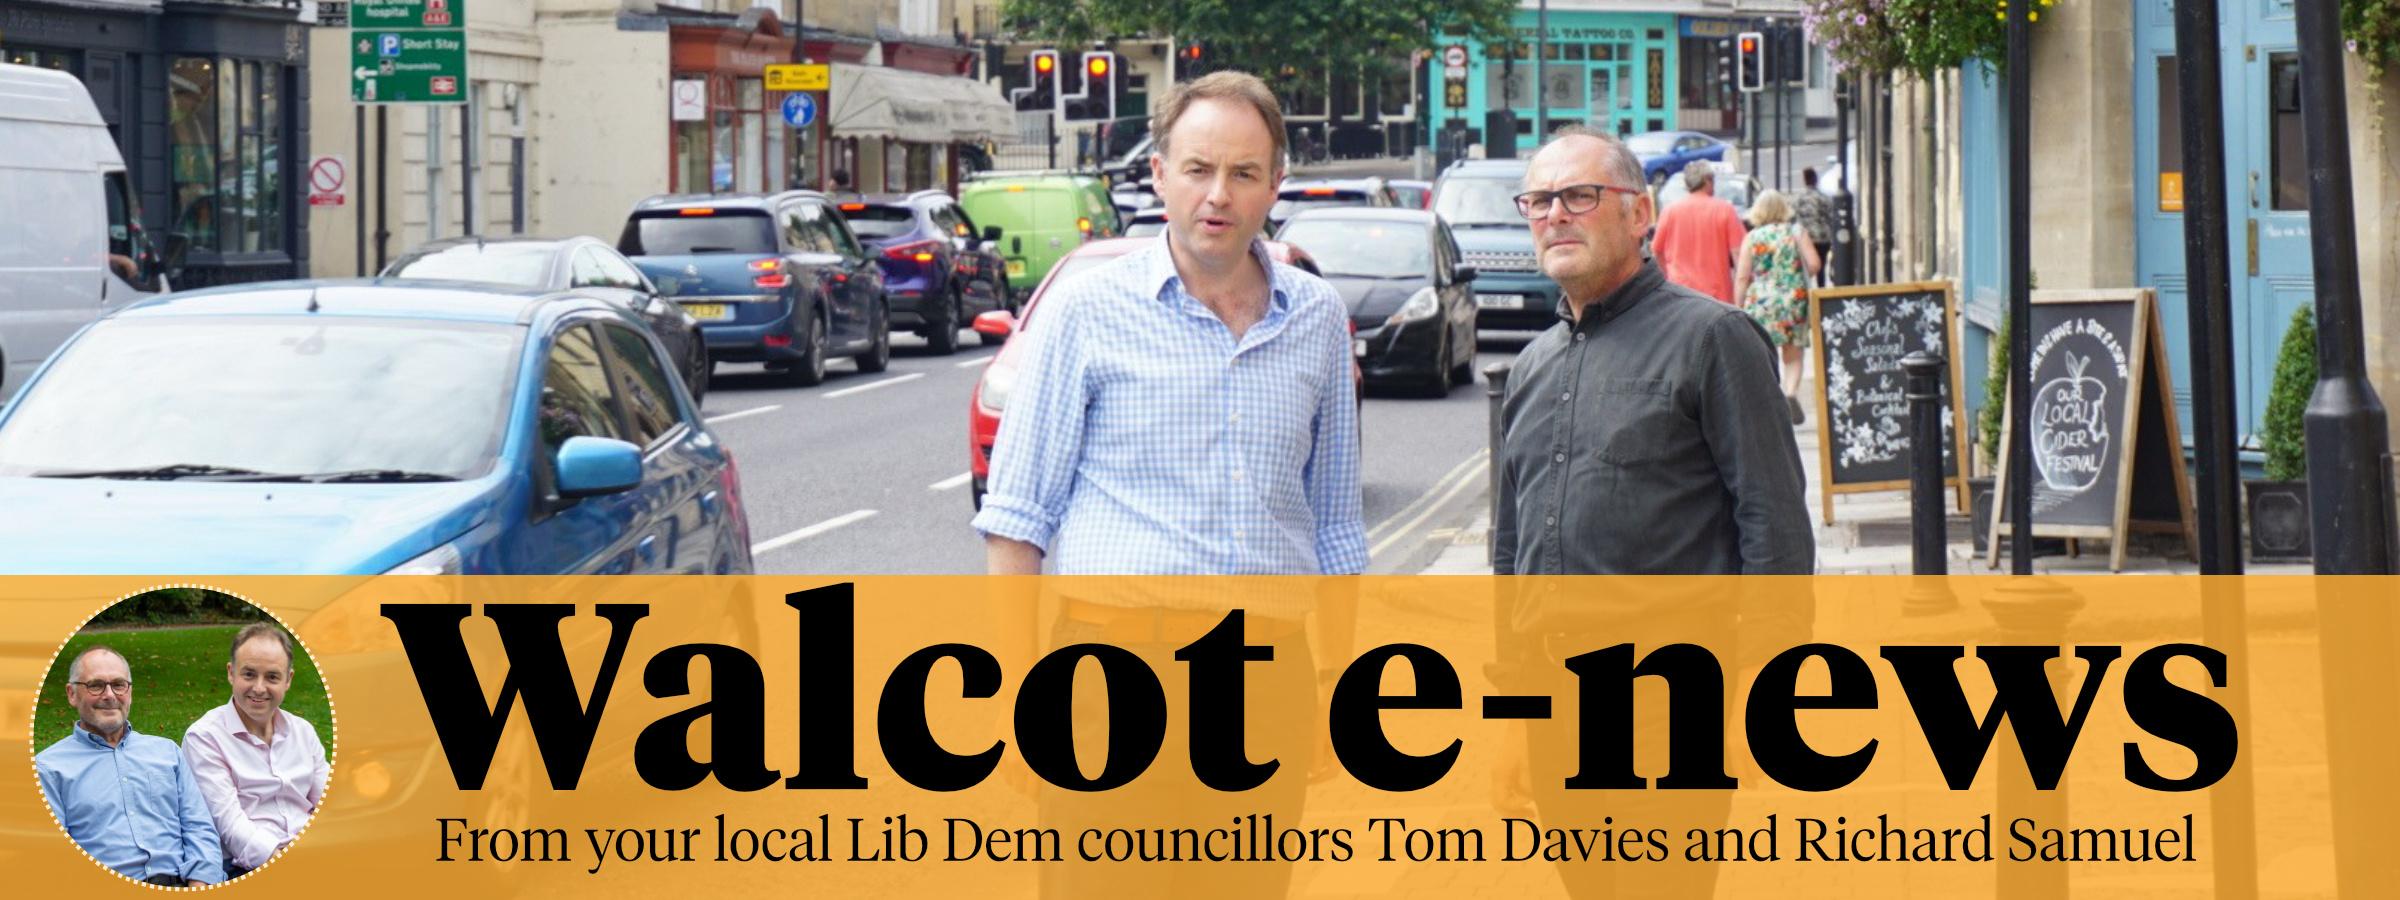 Walcot_e-news.jpg